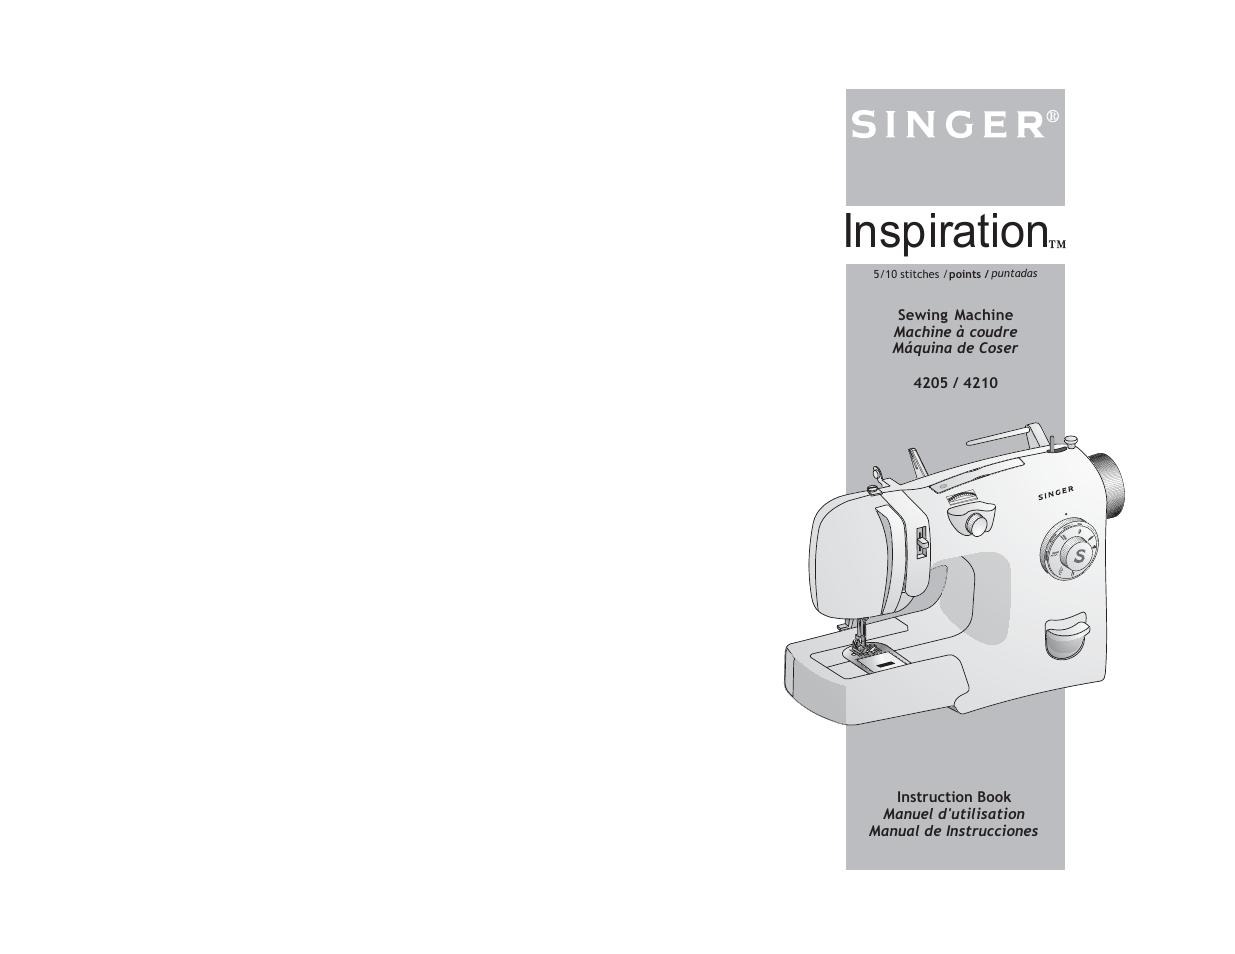 Manual Inspiration 4210 Singer